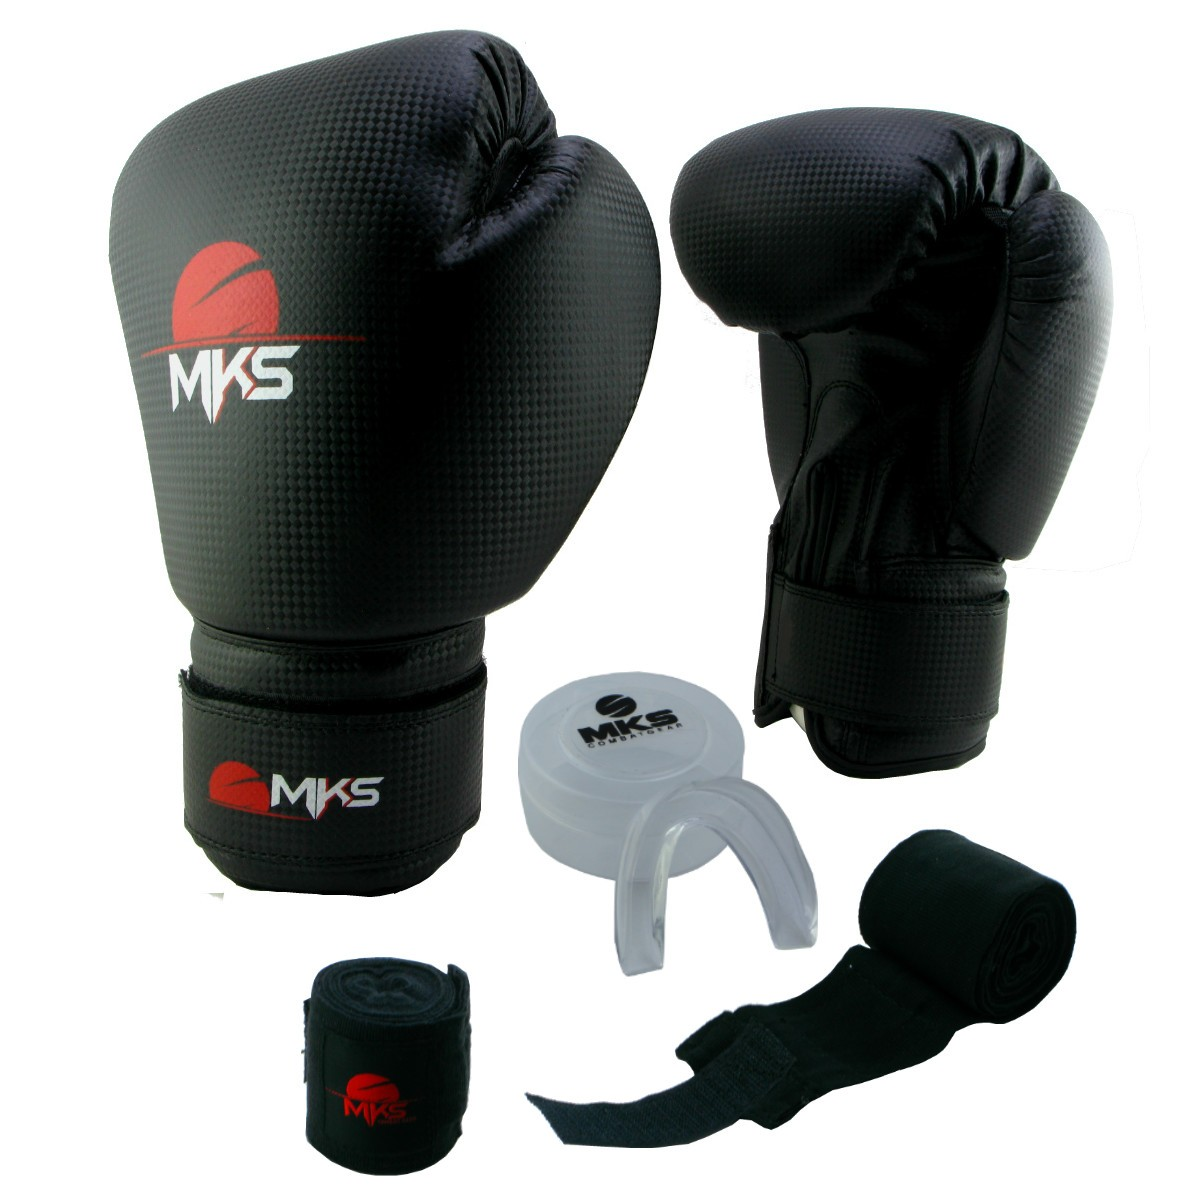 Luva de Boxe Prospect MKS Preta 16 oz + Protetor Bucal + Bandagem